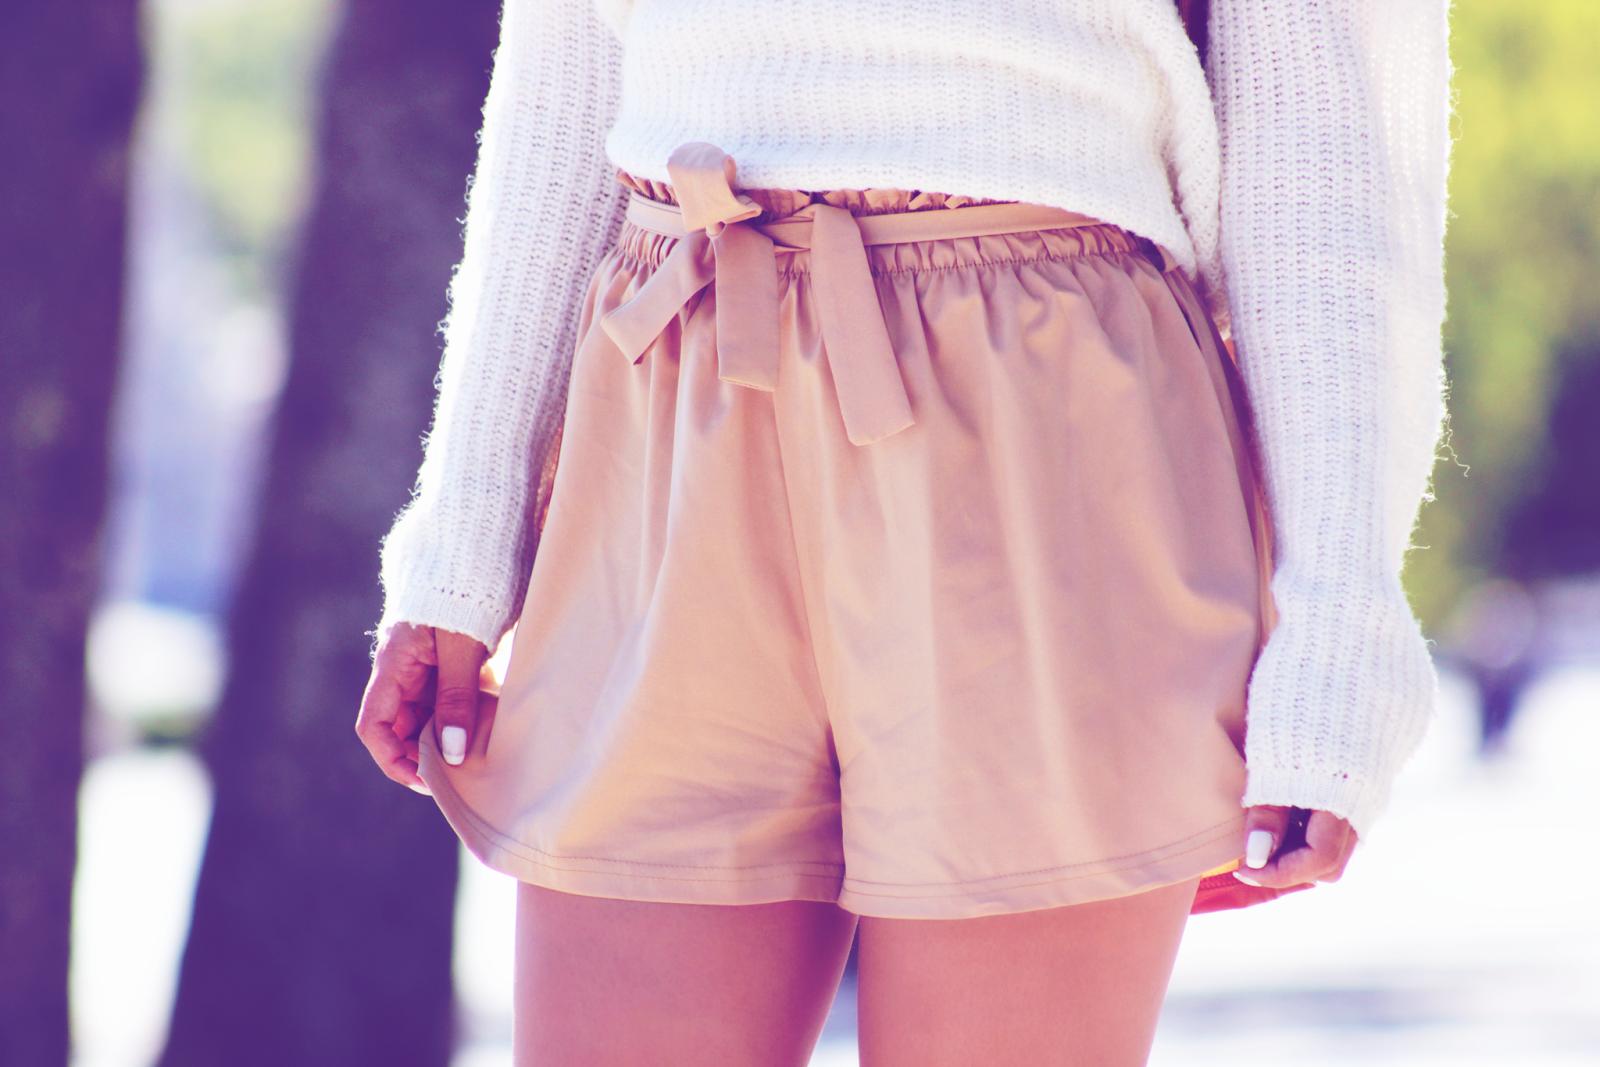 Rossetto http://www.cndirect.com/korean-style-fashion-women-high-waist-elastic-loose-pants-shorts 2$